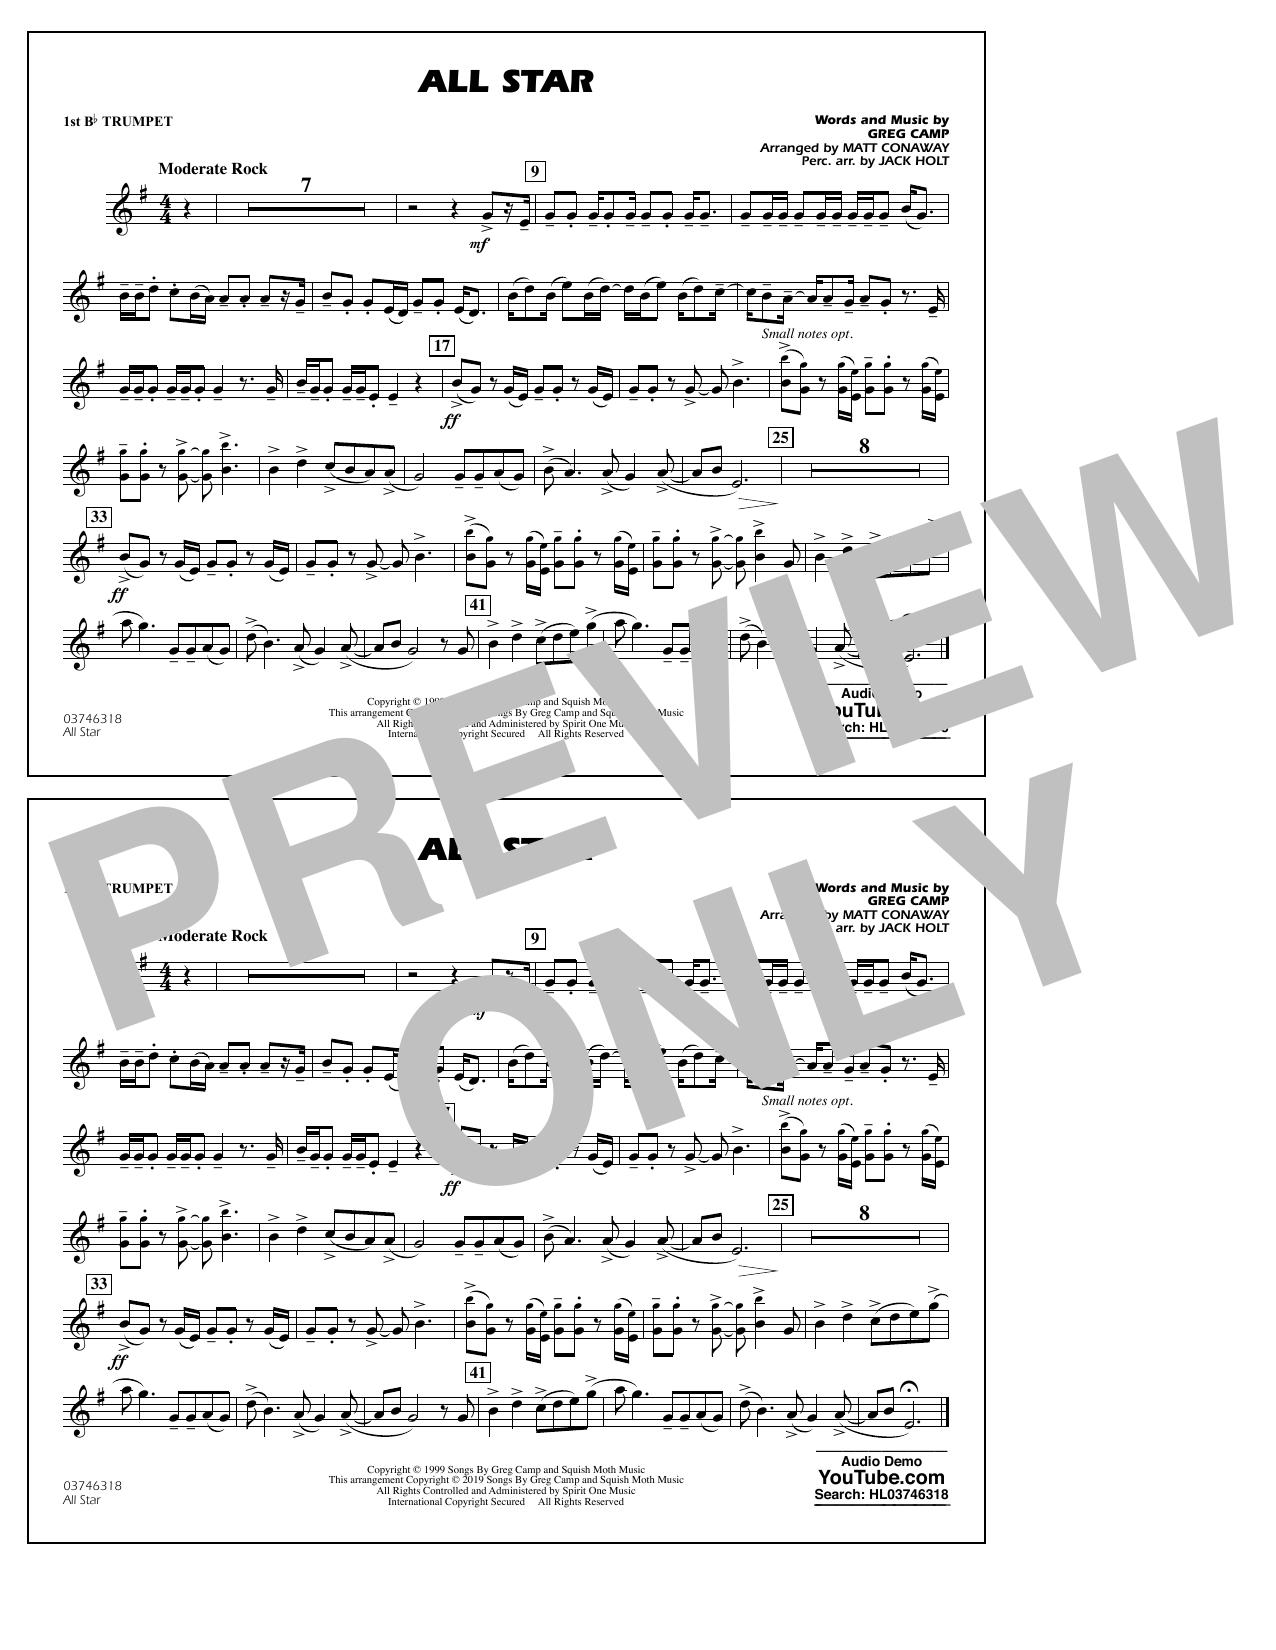 All Star (arr. Matt Conaway) - 1st Bb Trumpet (Marching Band)